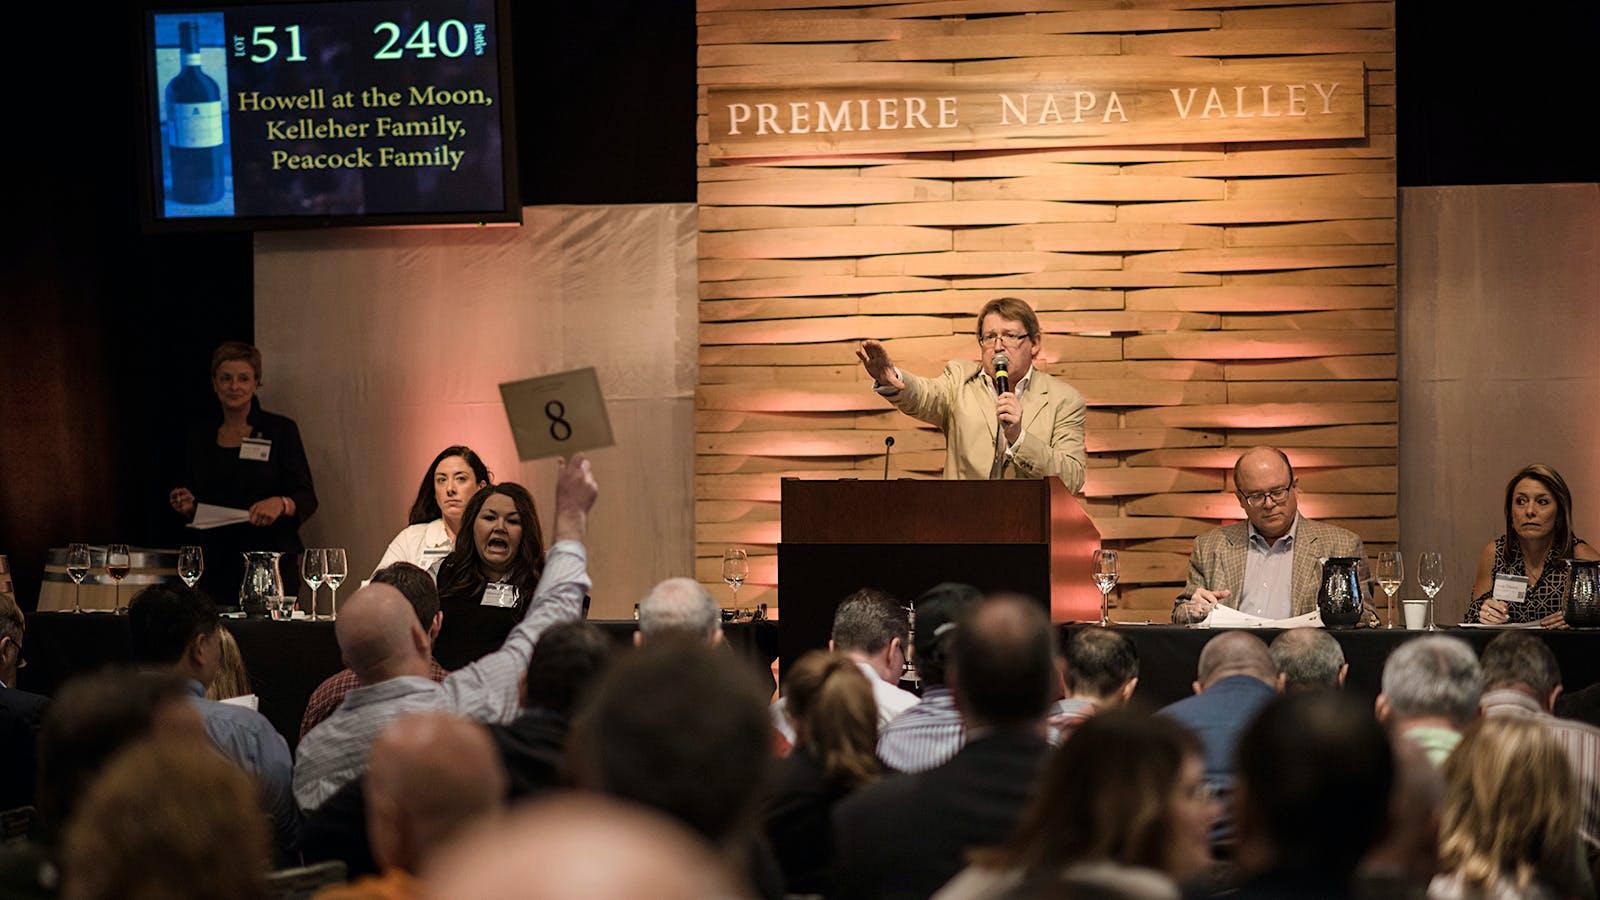 Premiere Napa Valley Sale Brings in a Record $6 Million